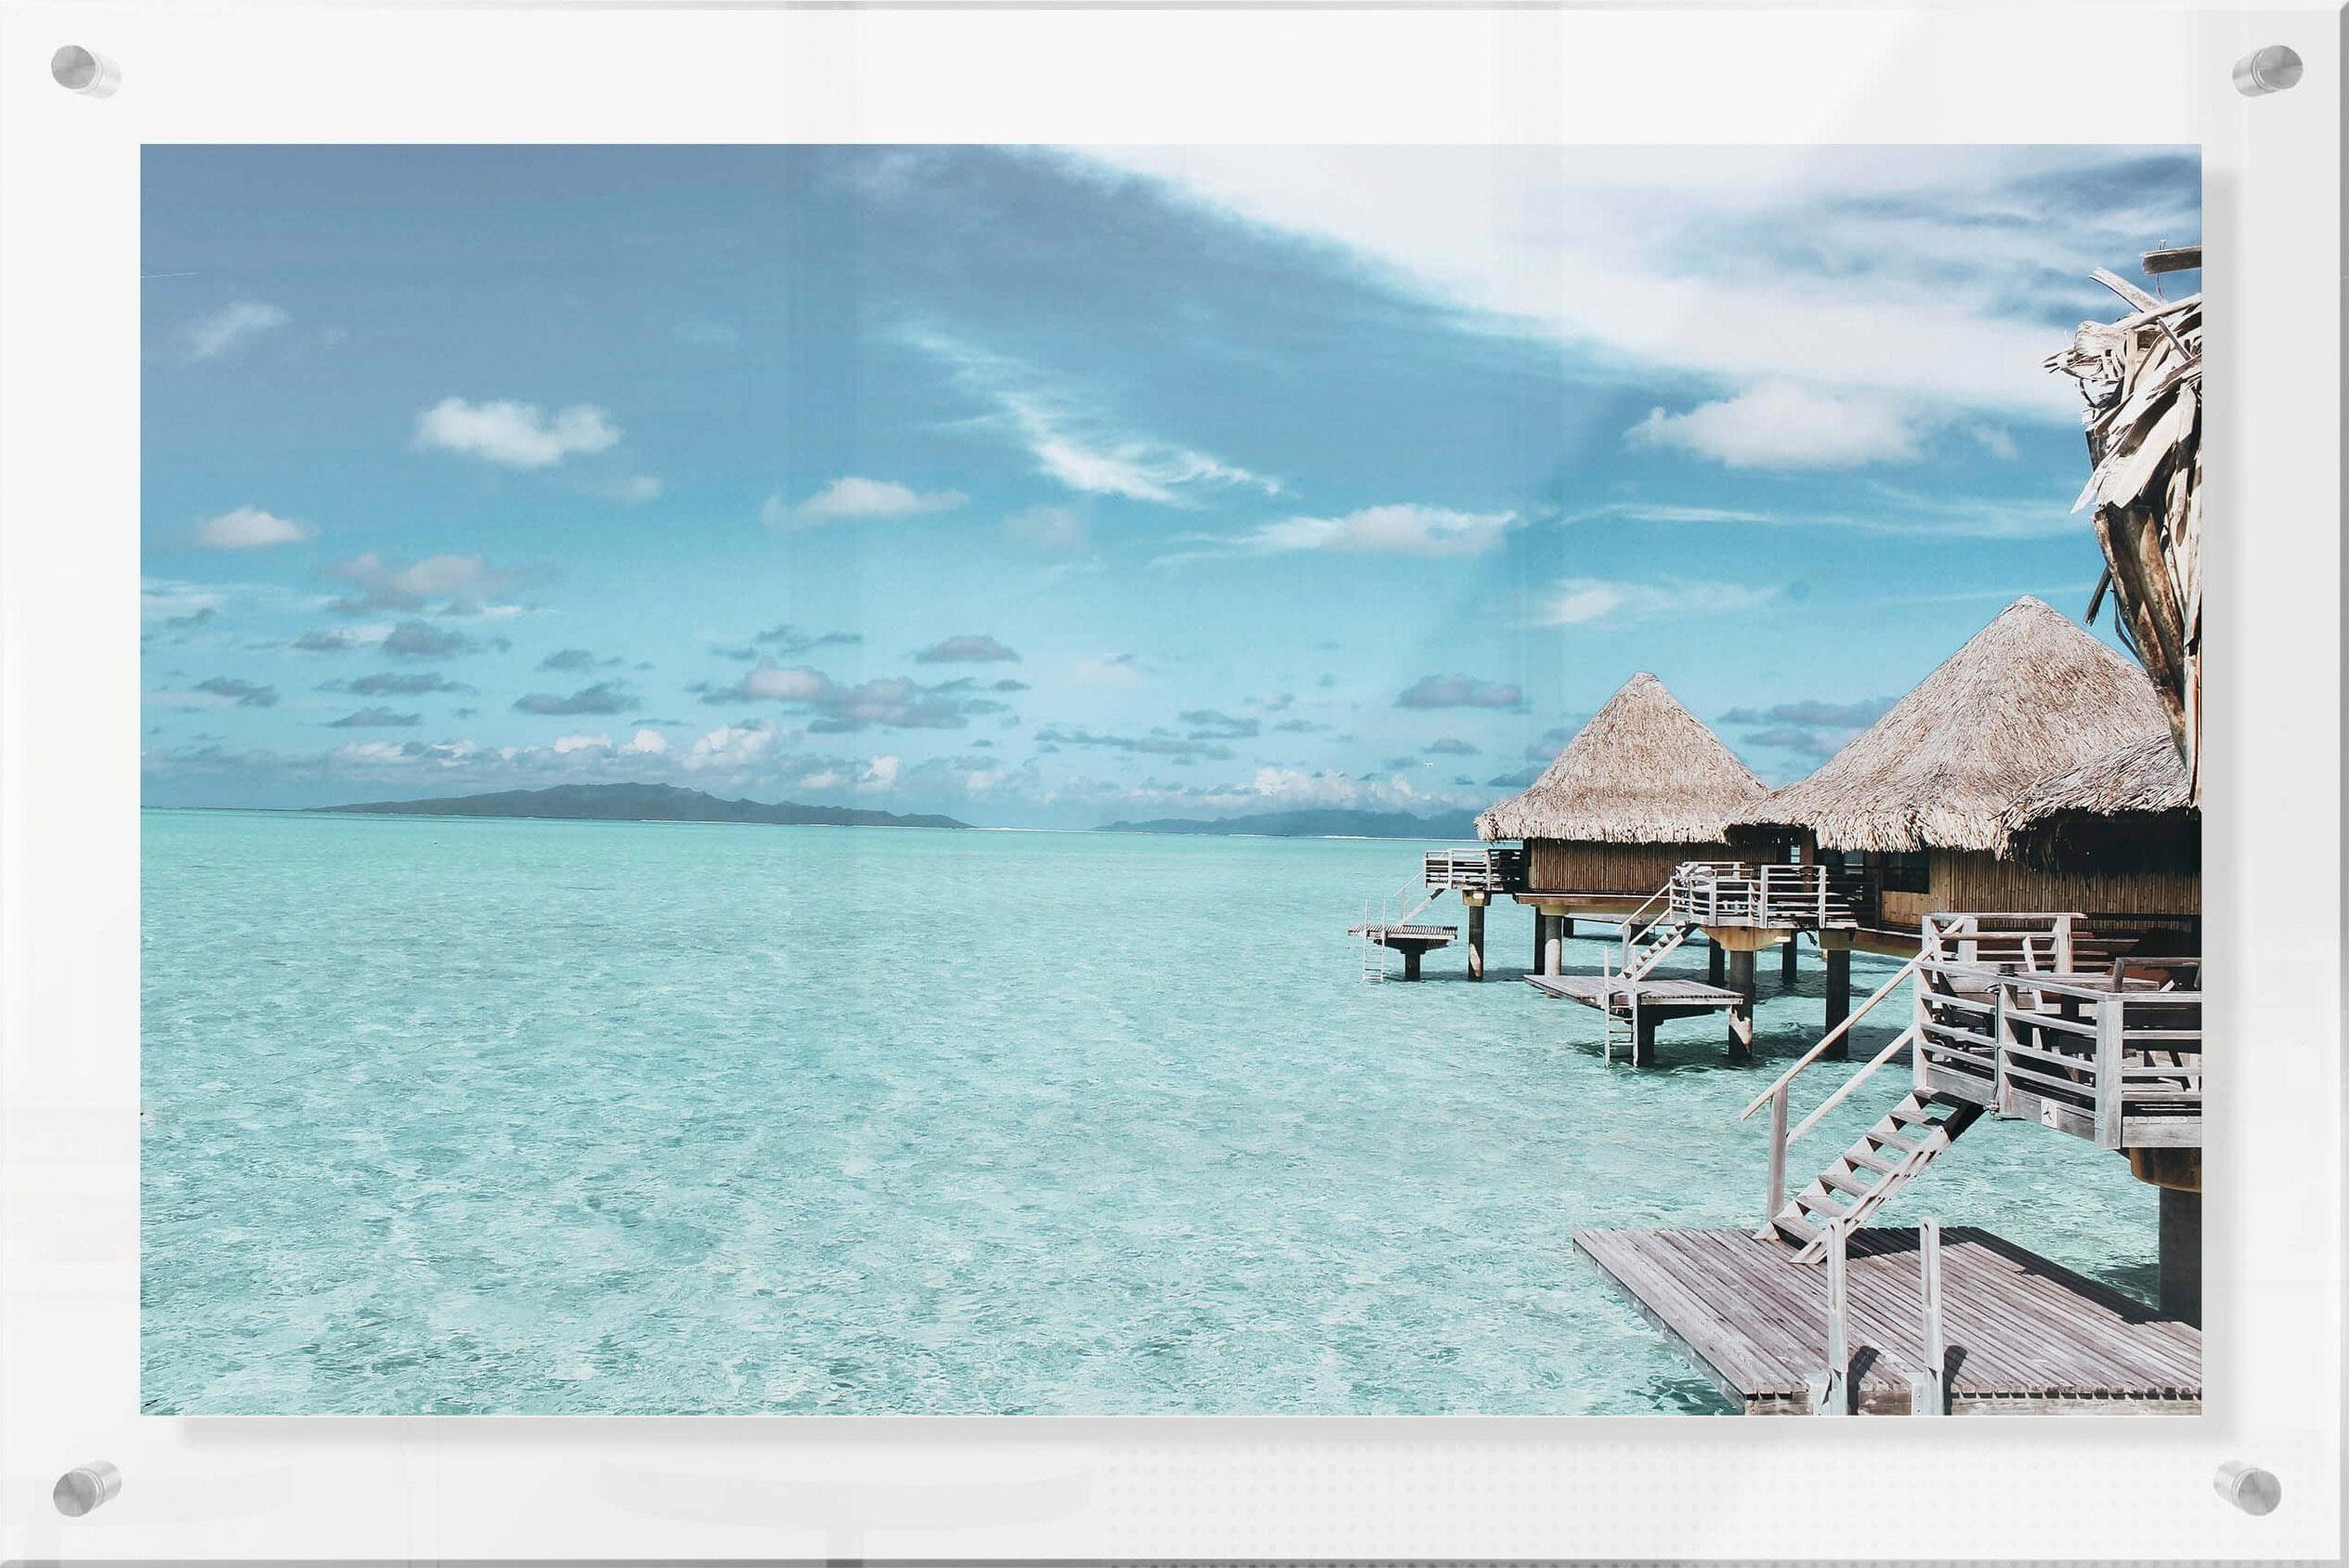 Acrylglasbild im Galeriestil »Urlaub auf den Malediven«, 98/0,5/68 cm